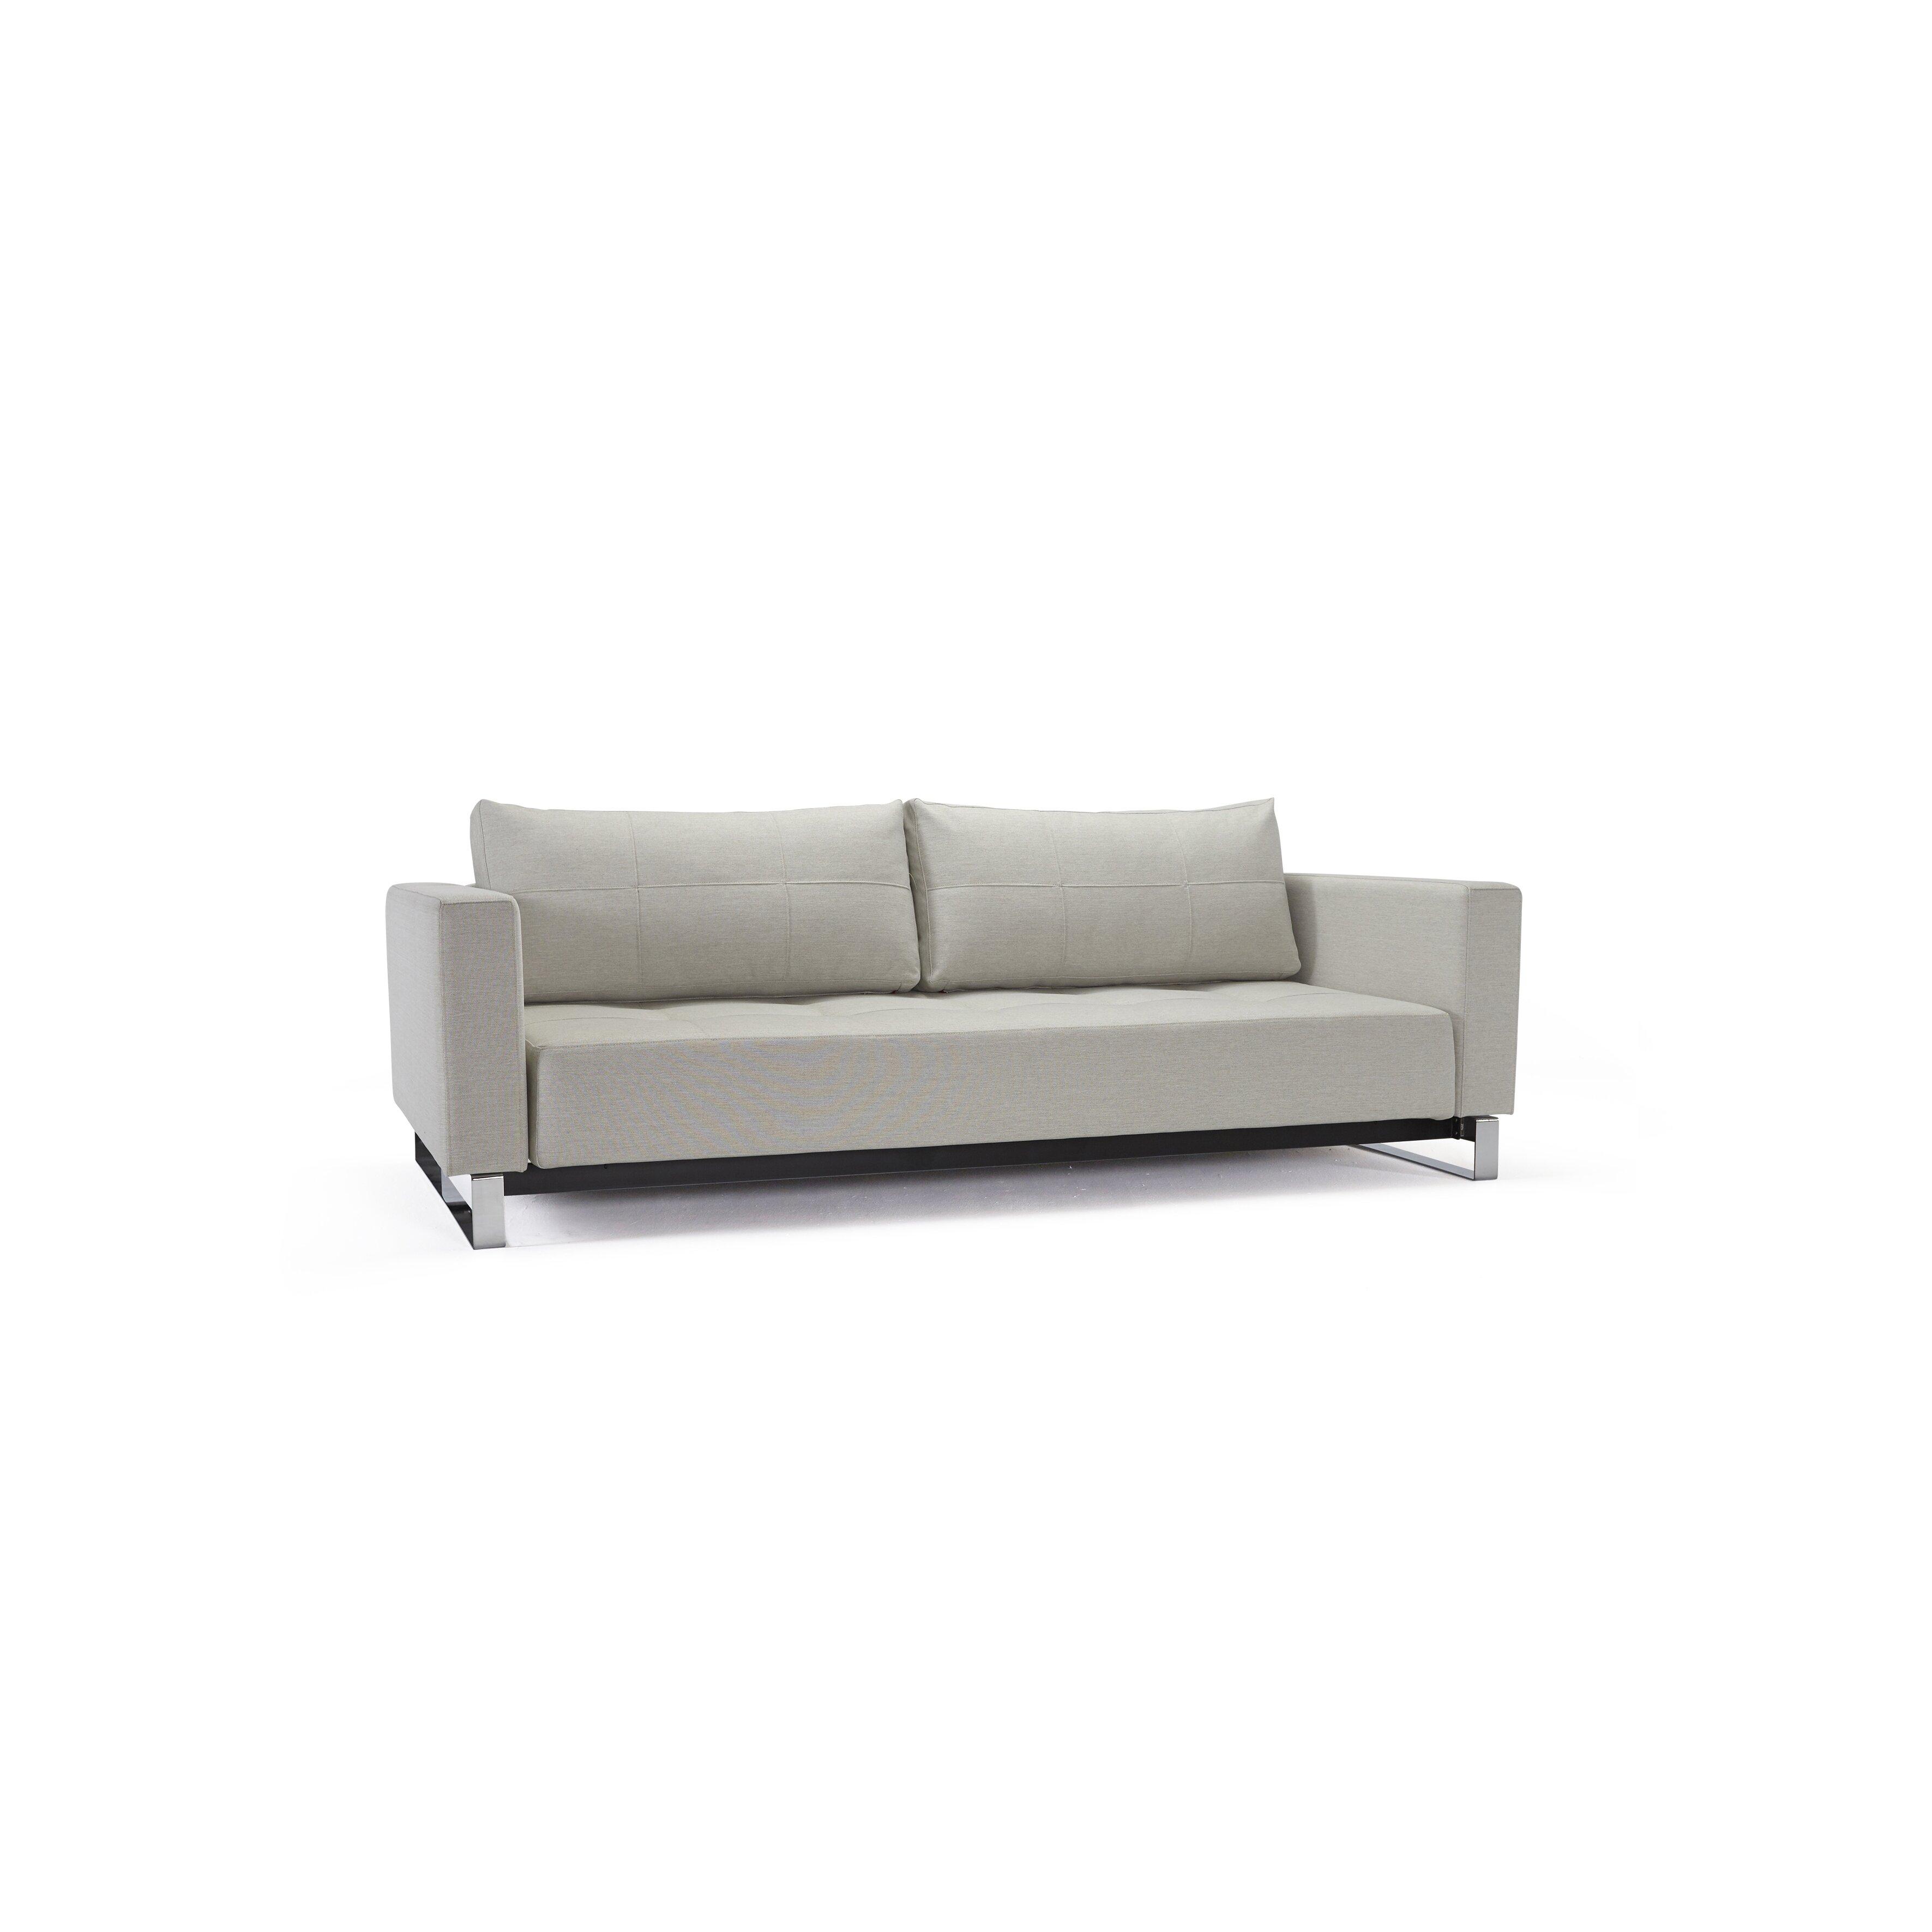 Innovation Living Inc Cassius Deluxe Excess Sleeper Sofa Reviews Wayfair